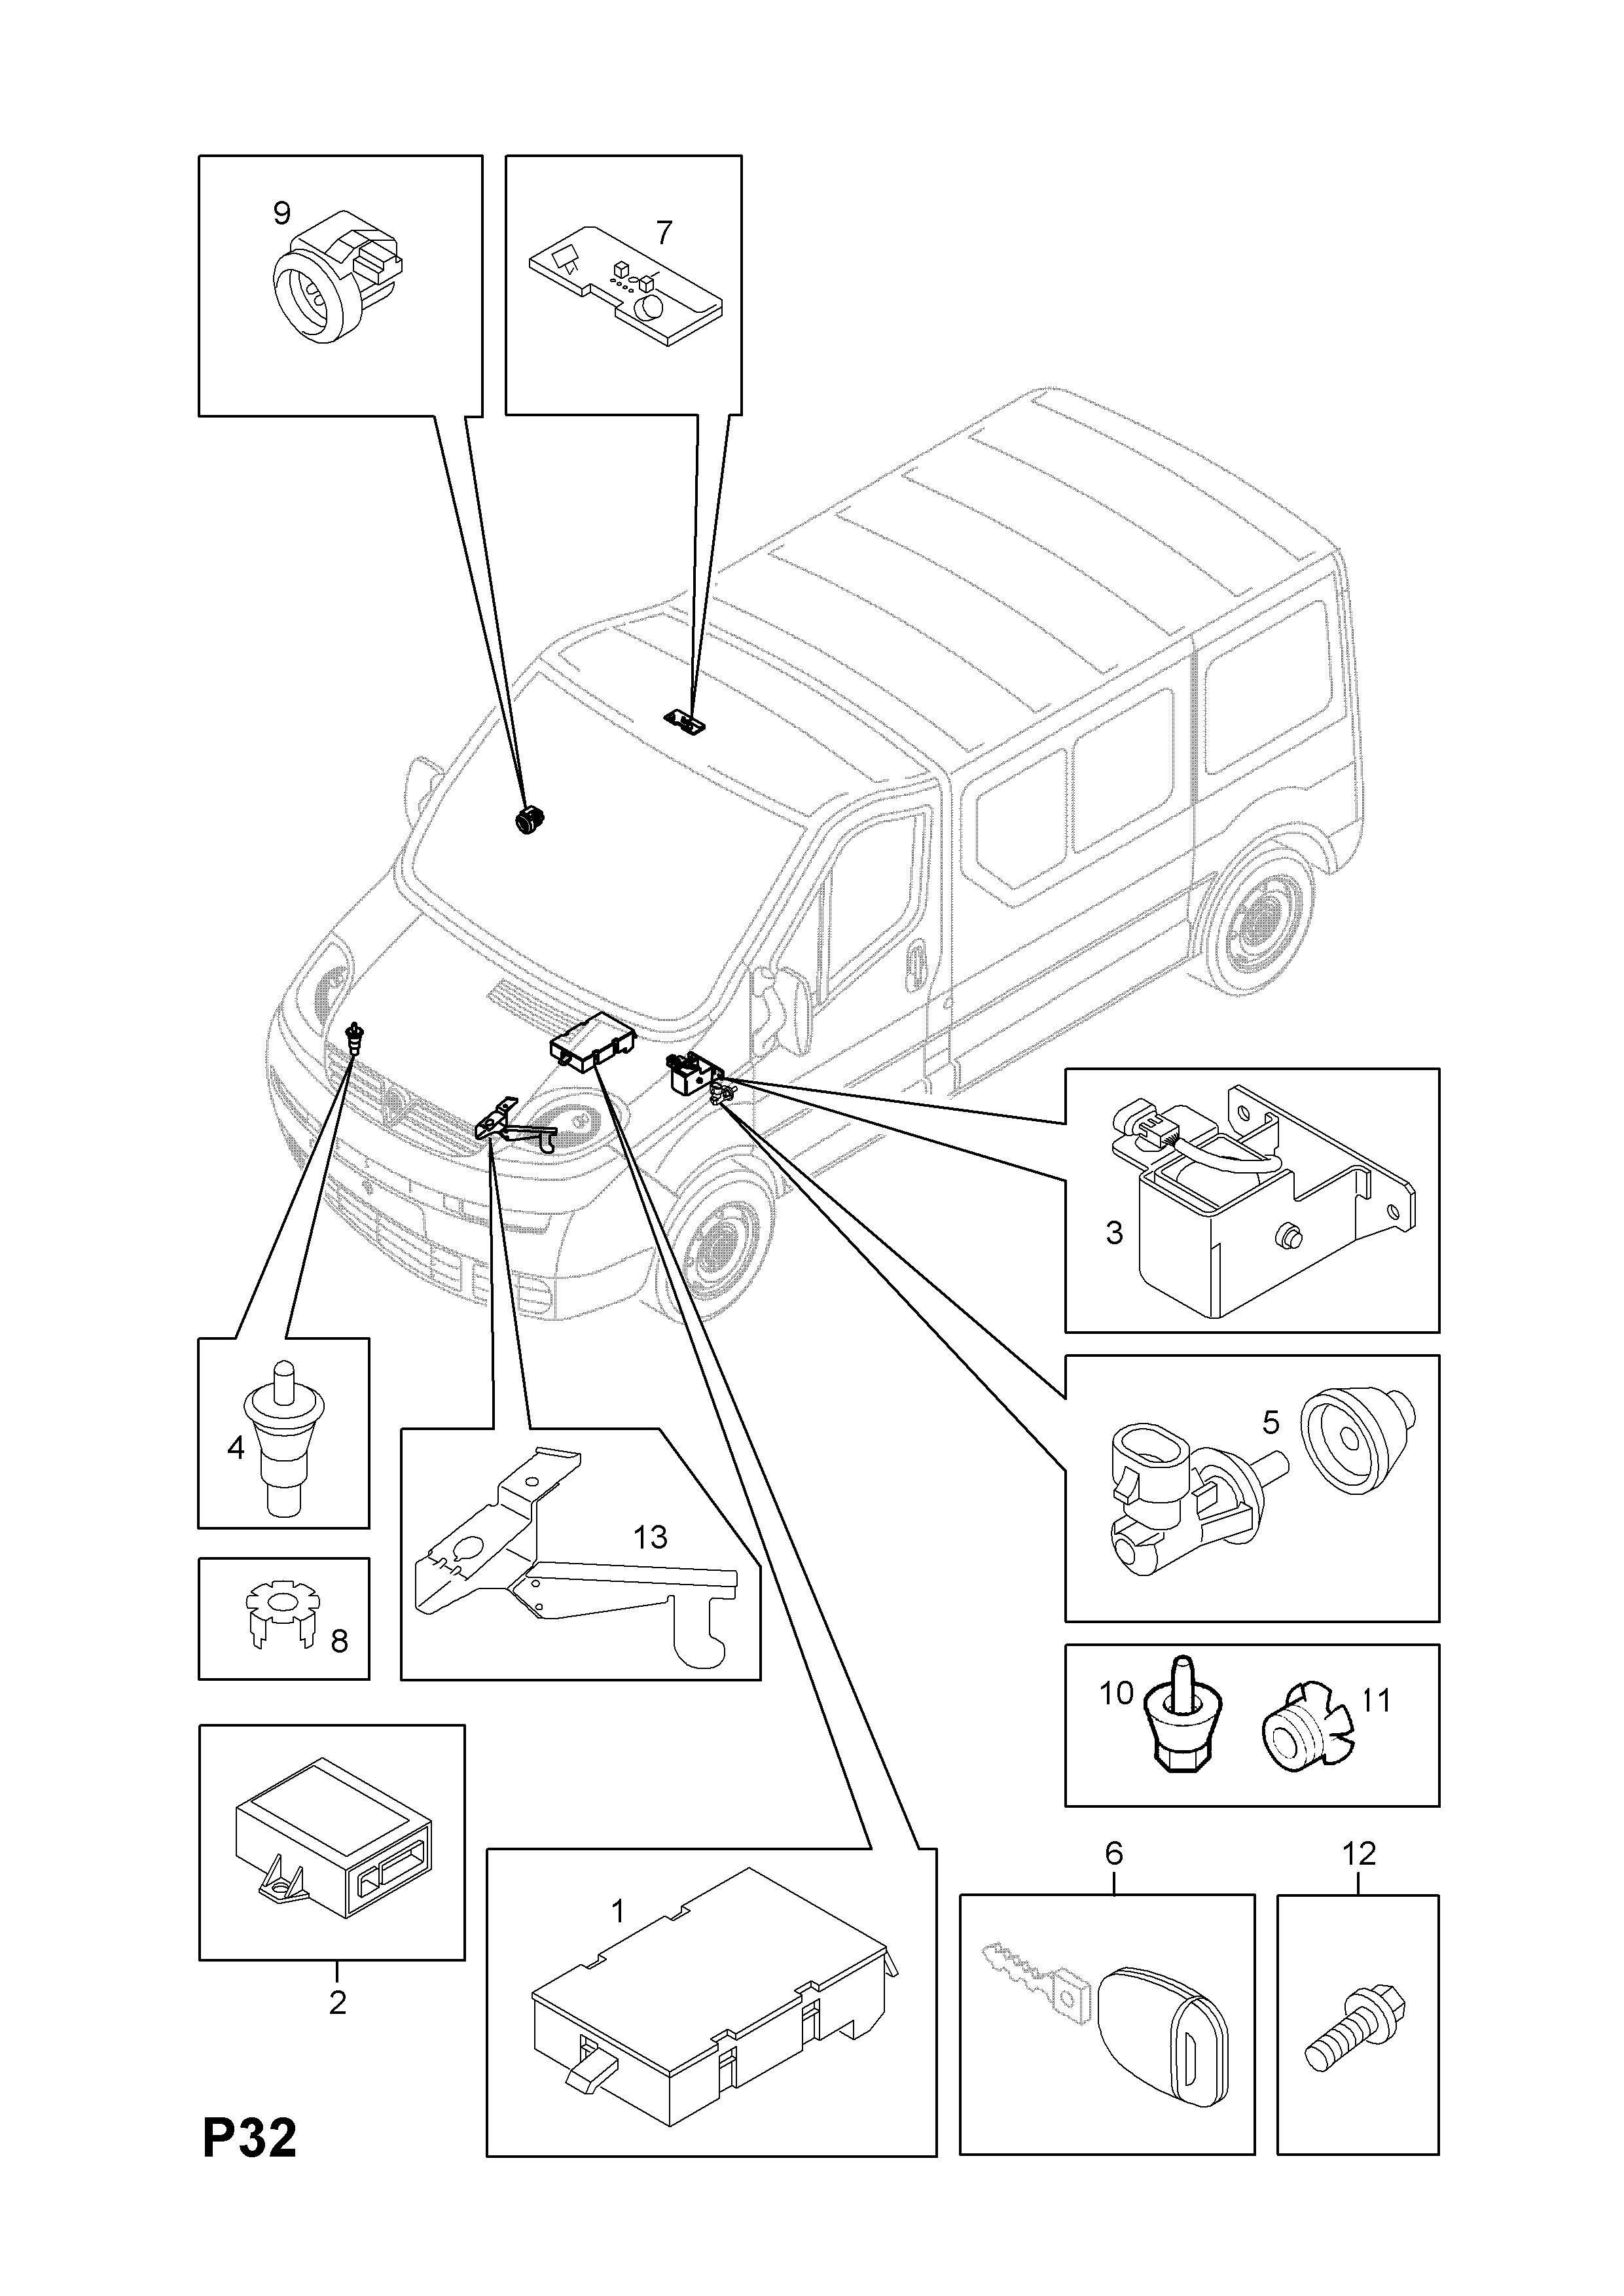 WRG-7963] Vauxhall Vivaro Central Locking Wiring Diagram on